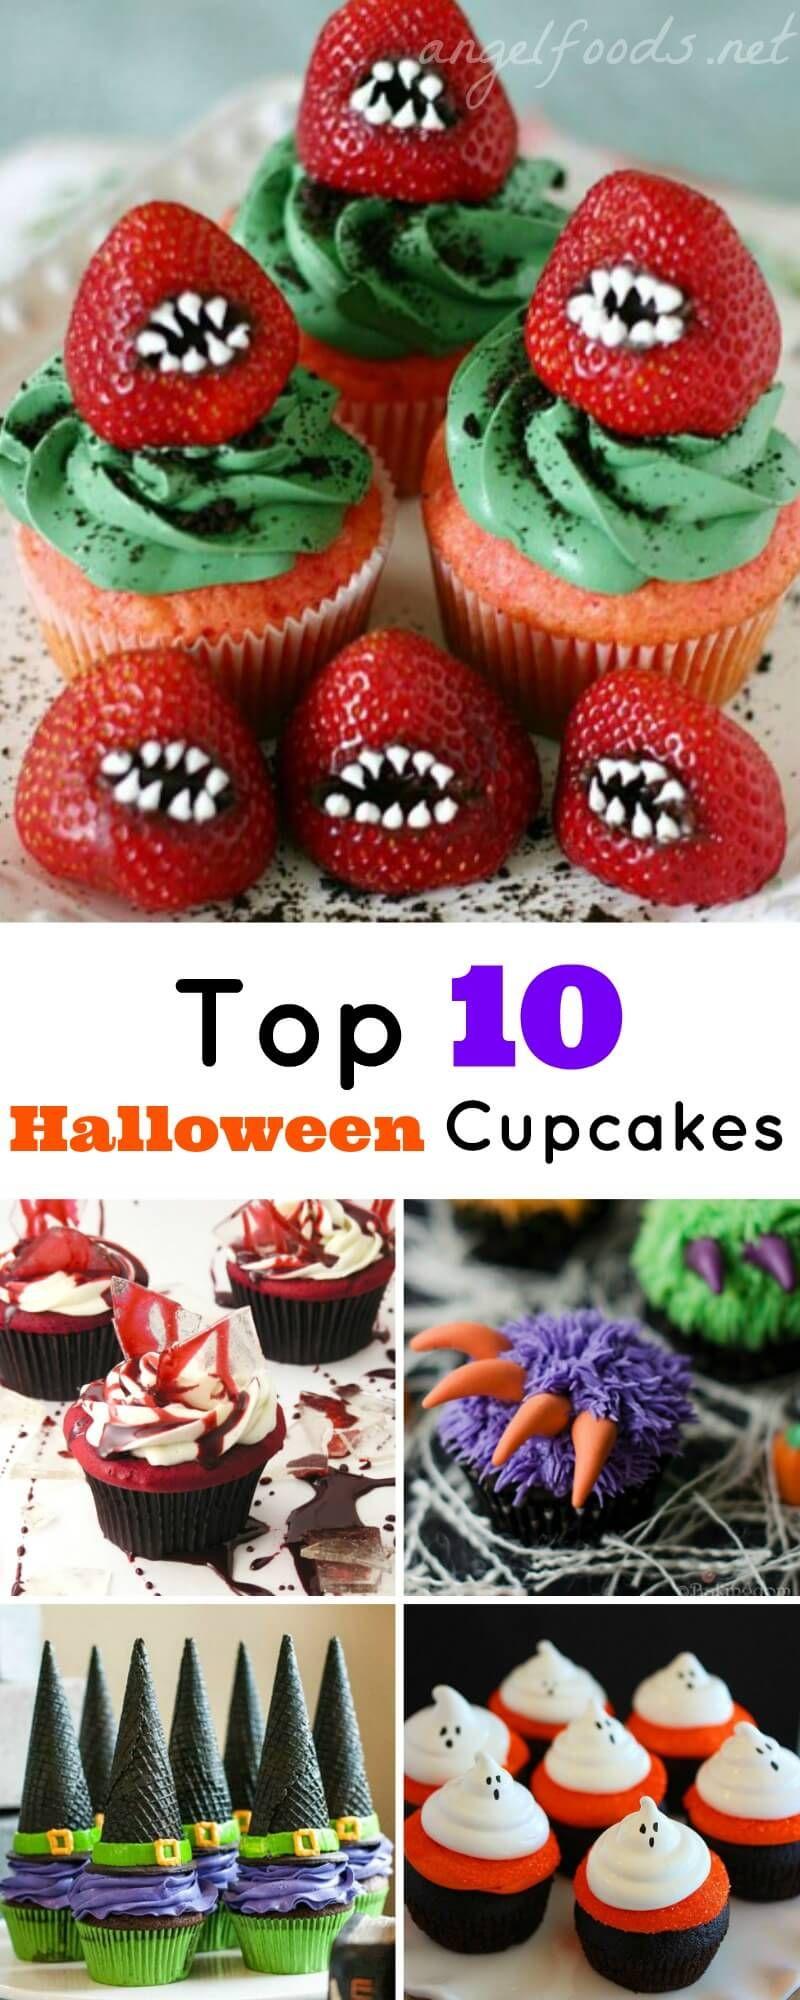 Top 10 Halloween Cupcakes